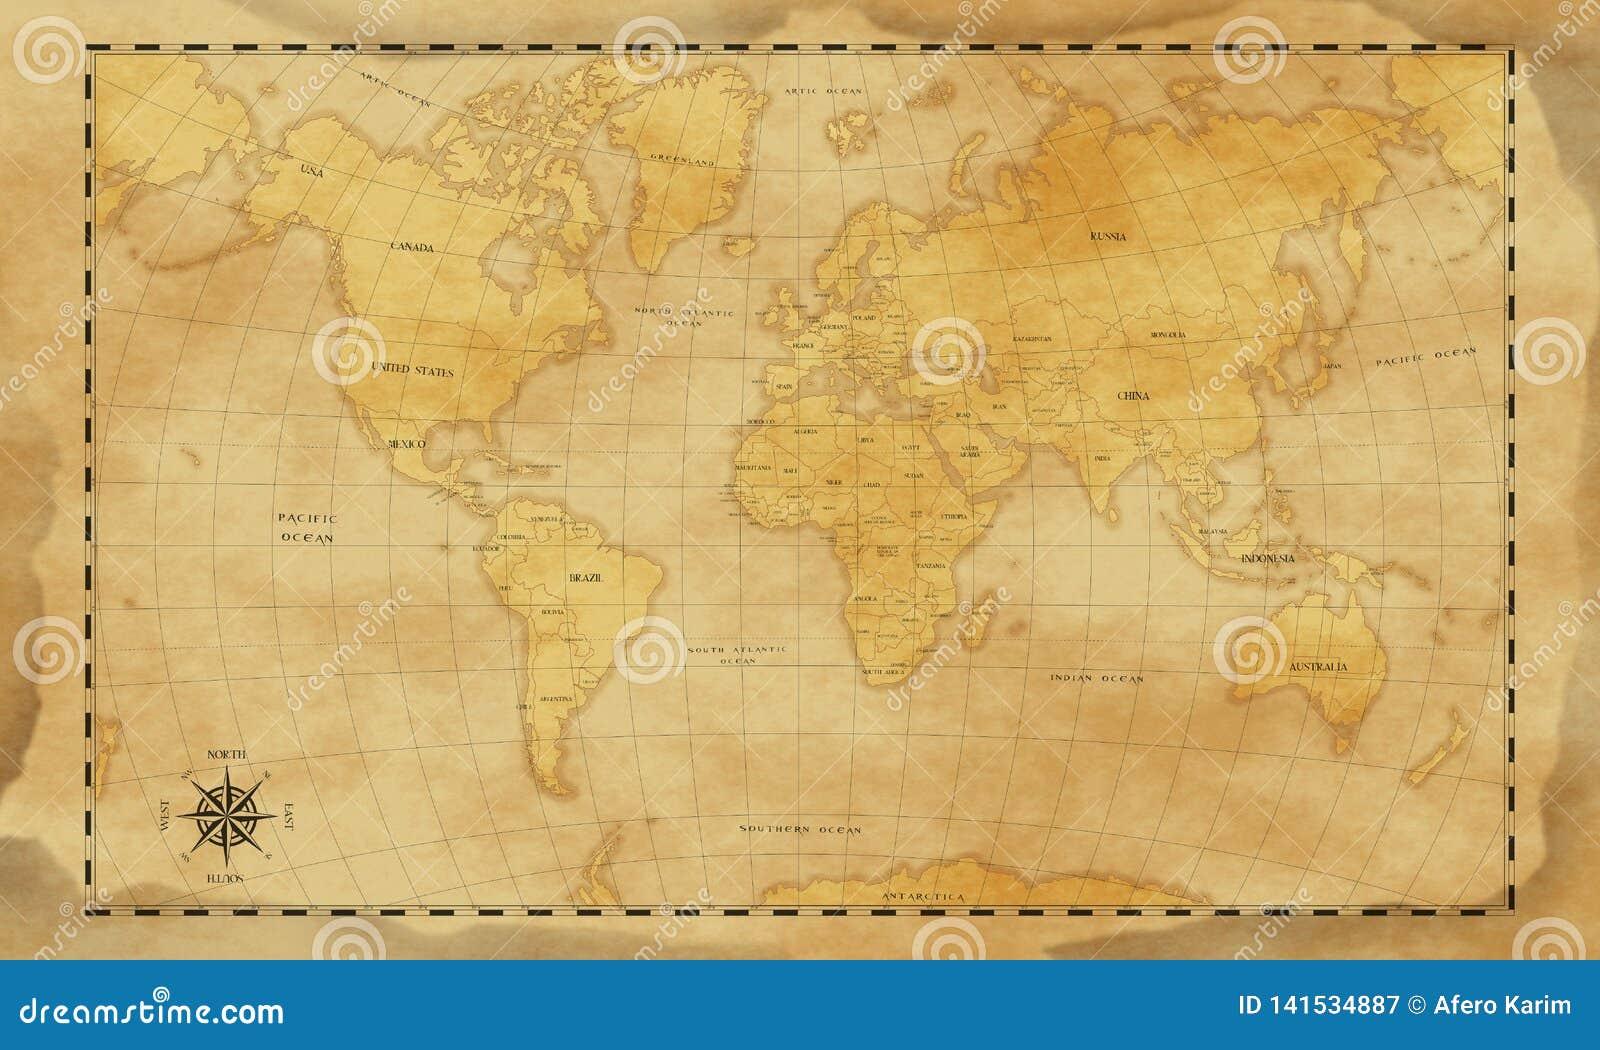 Vintage style world map background